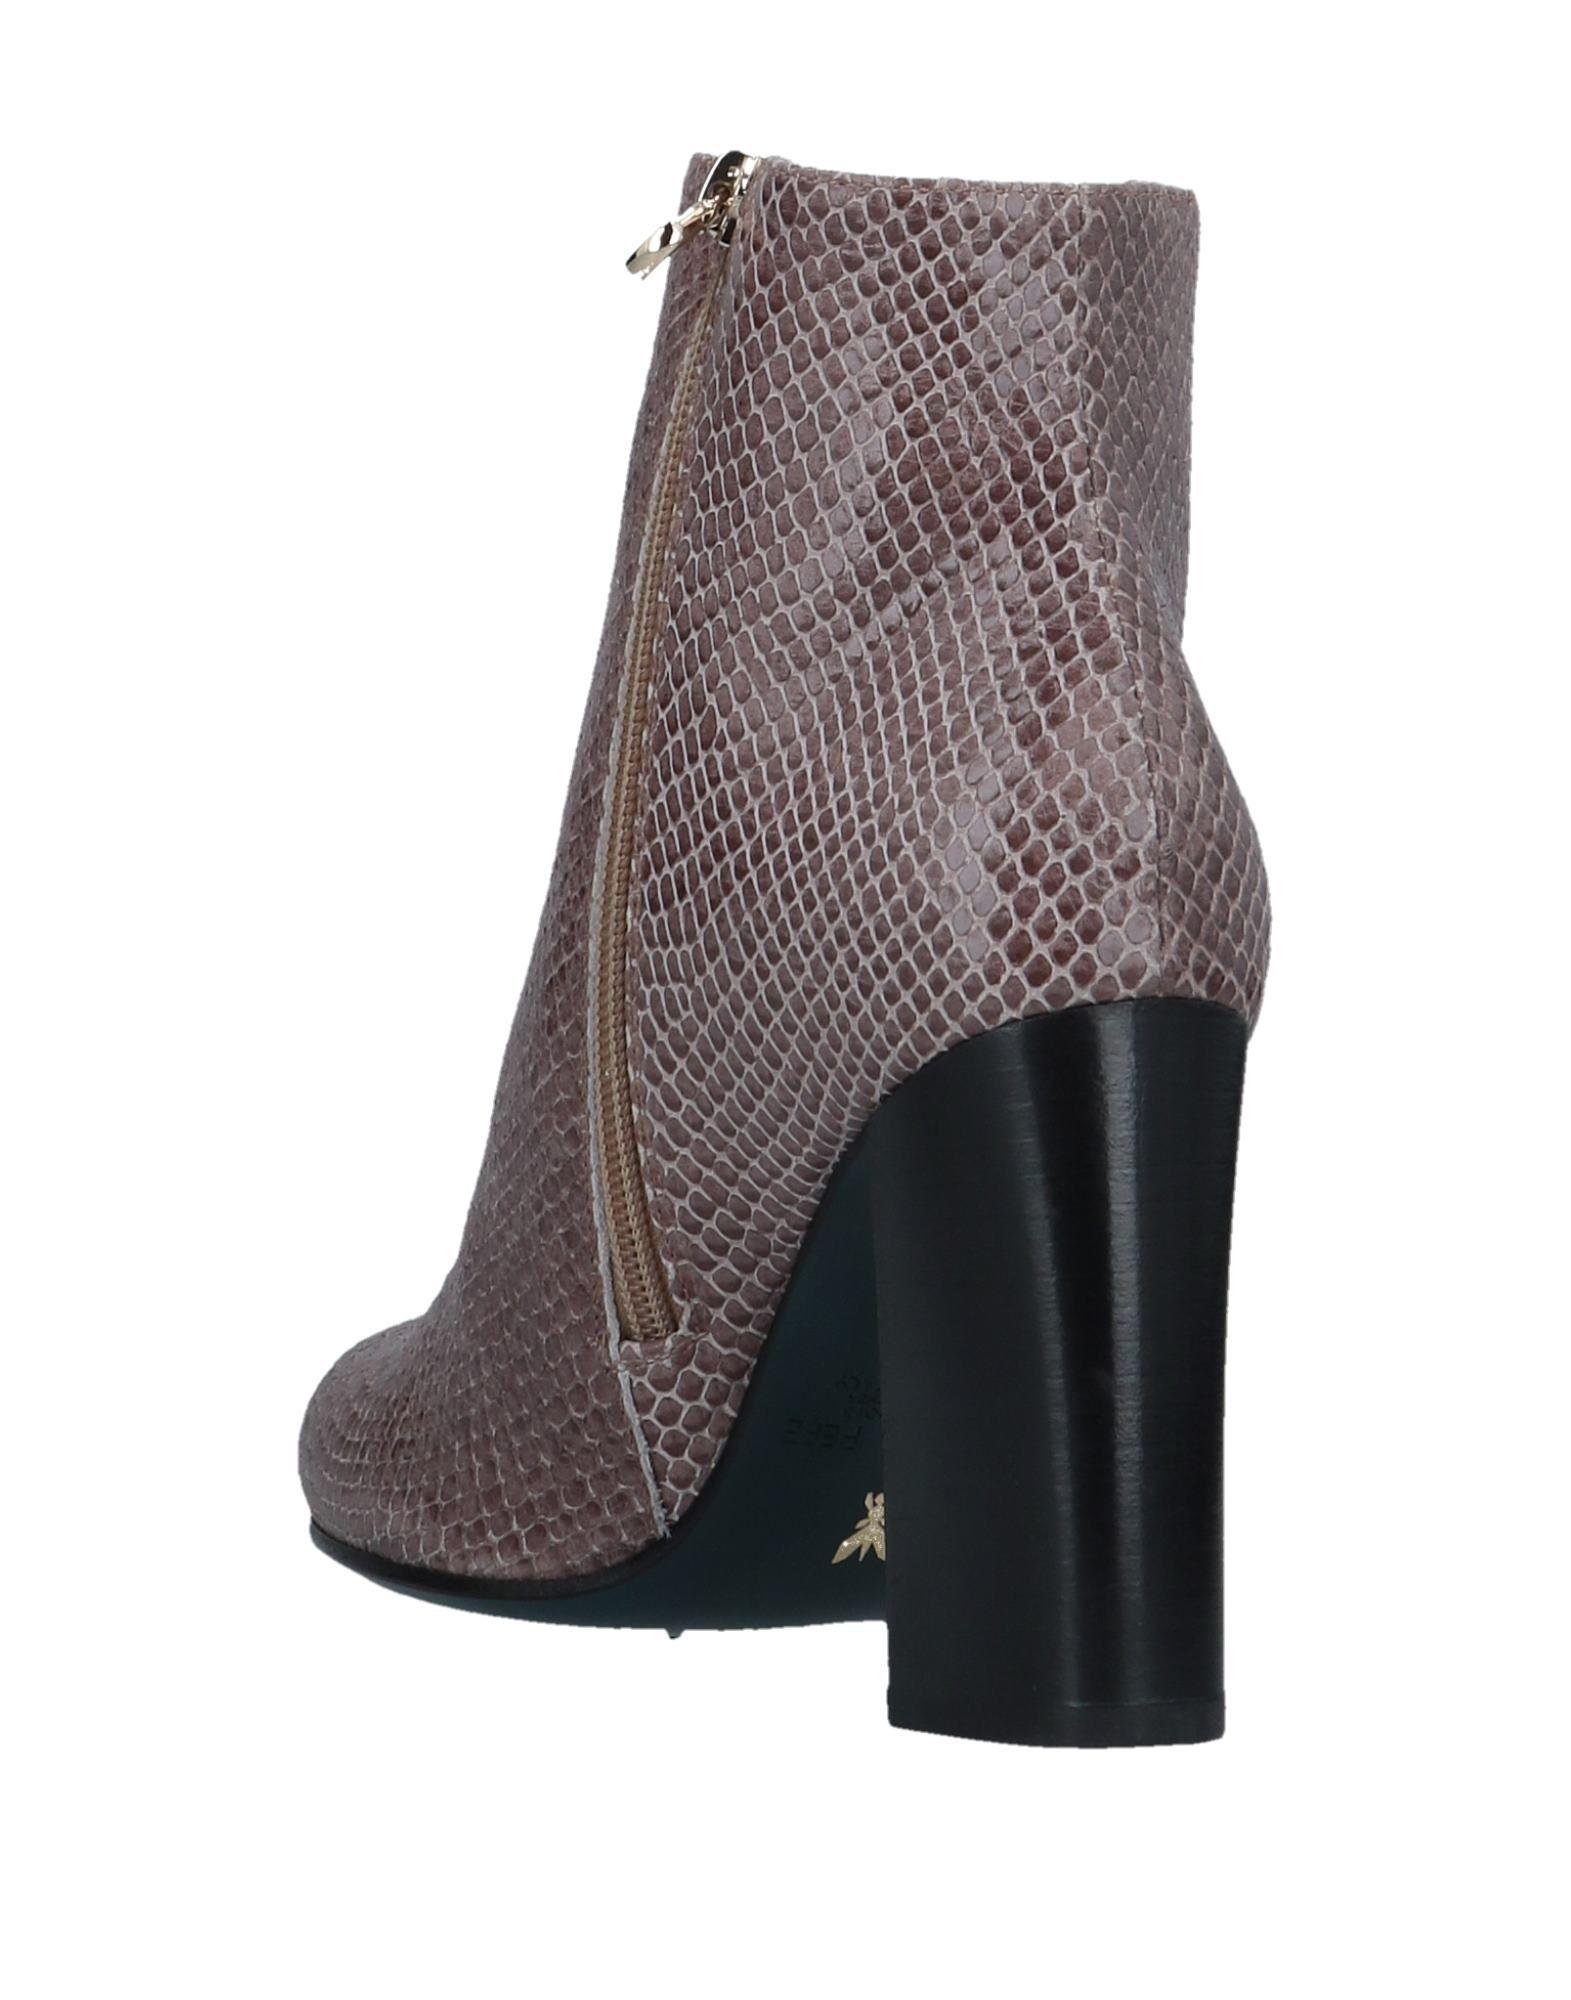 Stilvolle billige Schuhe Patrizia 11527250EG Pepe Stiefelette Damen  11527250EG Patrizia 3ddcea